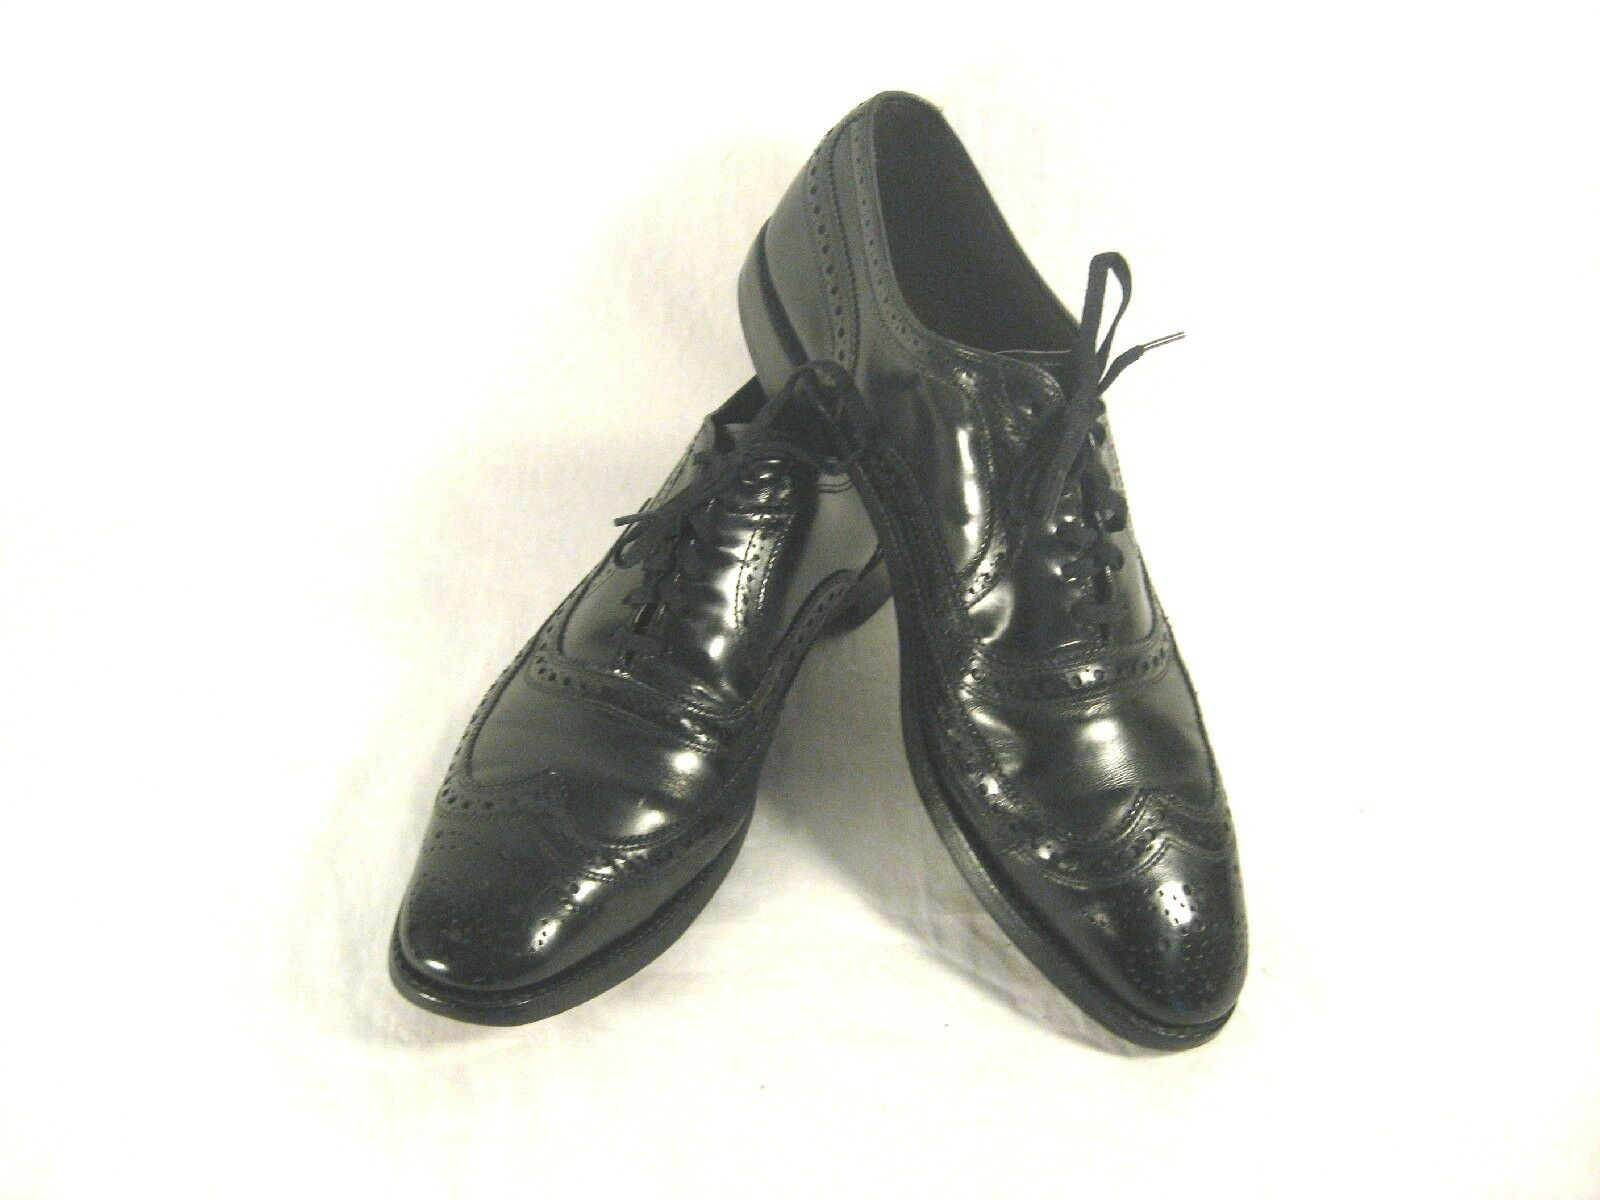 Vintage Allen Edmonds McAllister Pelle Wing-Tip Oxford Uomo  Shoes 10.5aaa